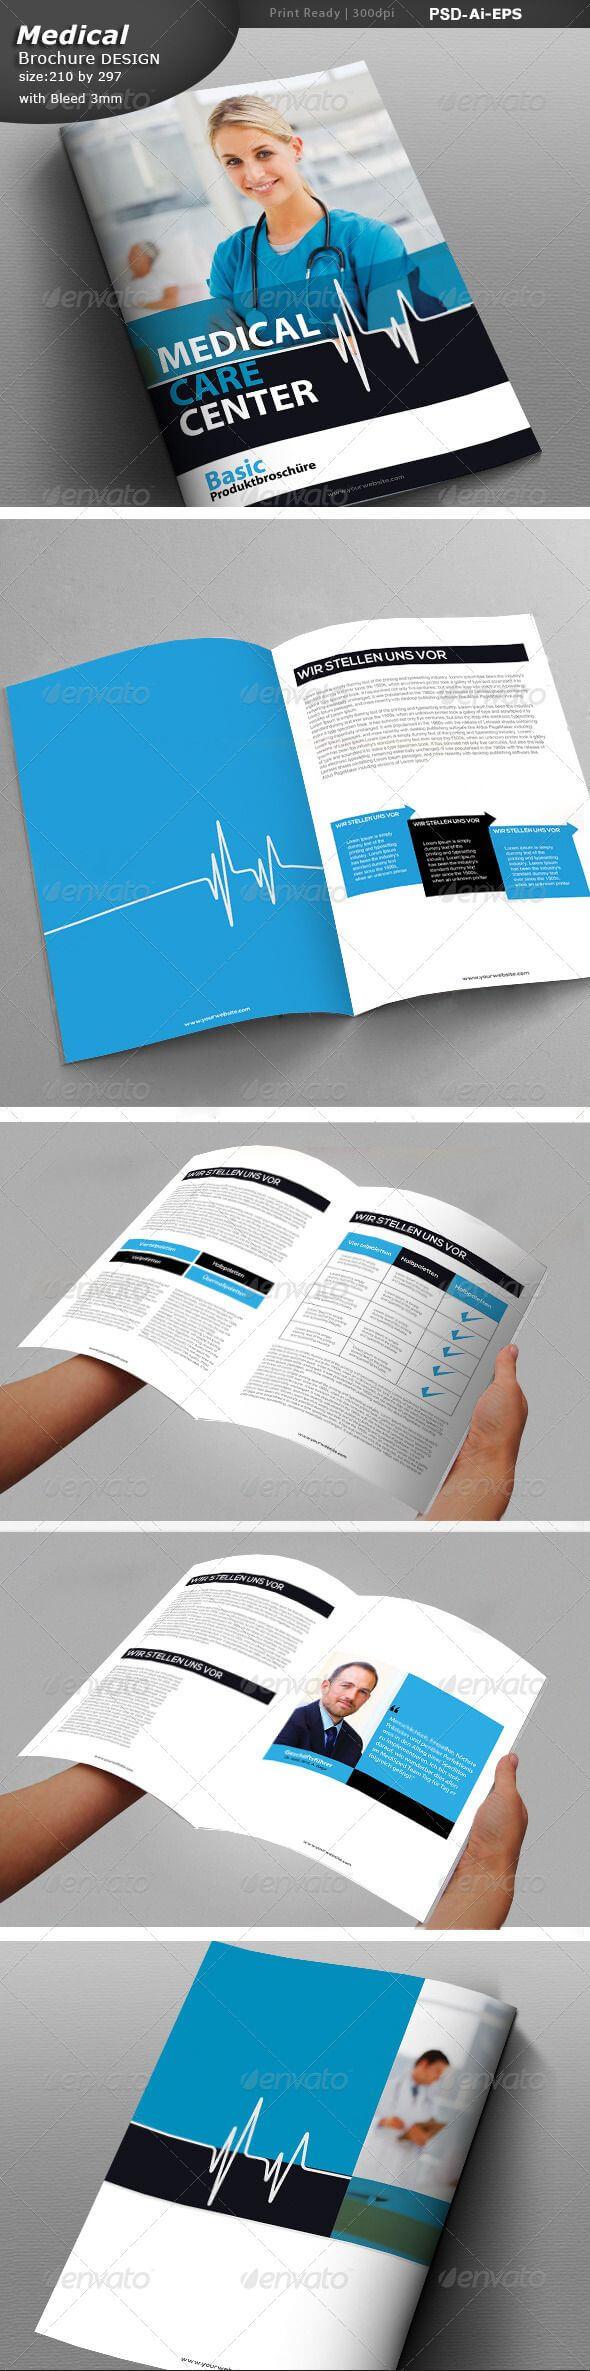 Medical Center Brochure Design - Print Templates | Ads in Medical Office Brochure Templates